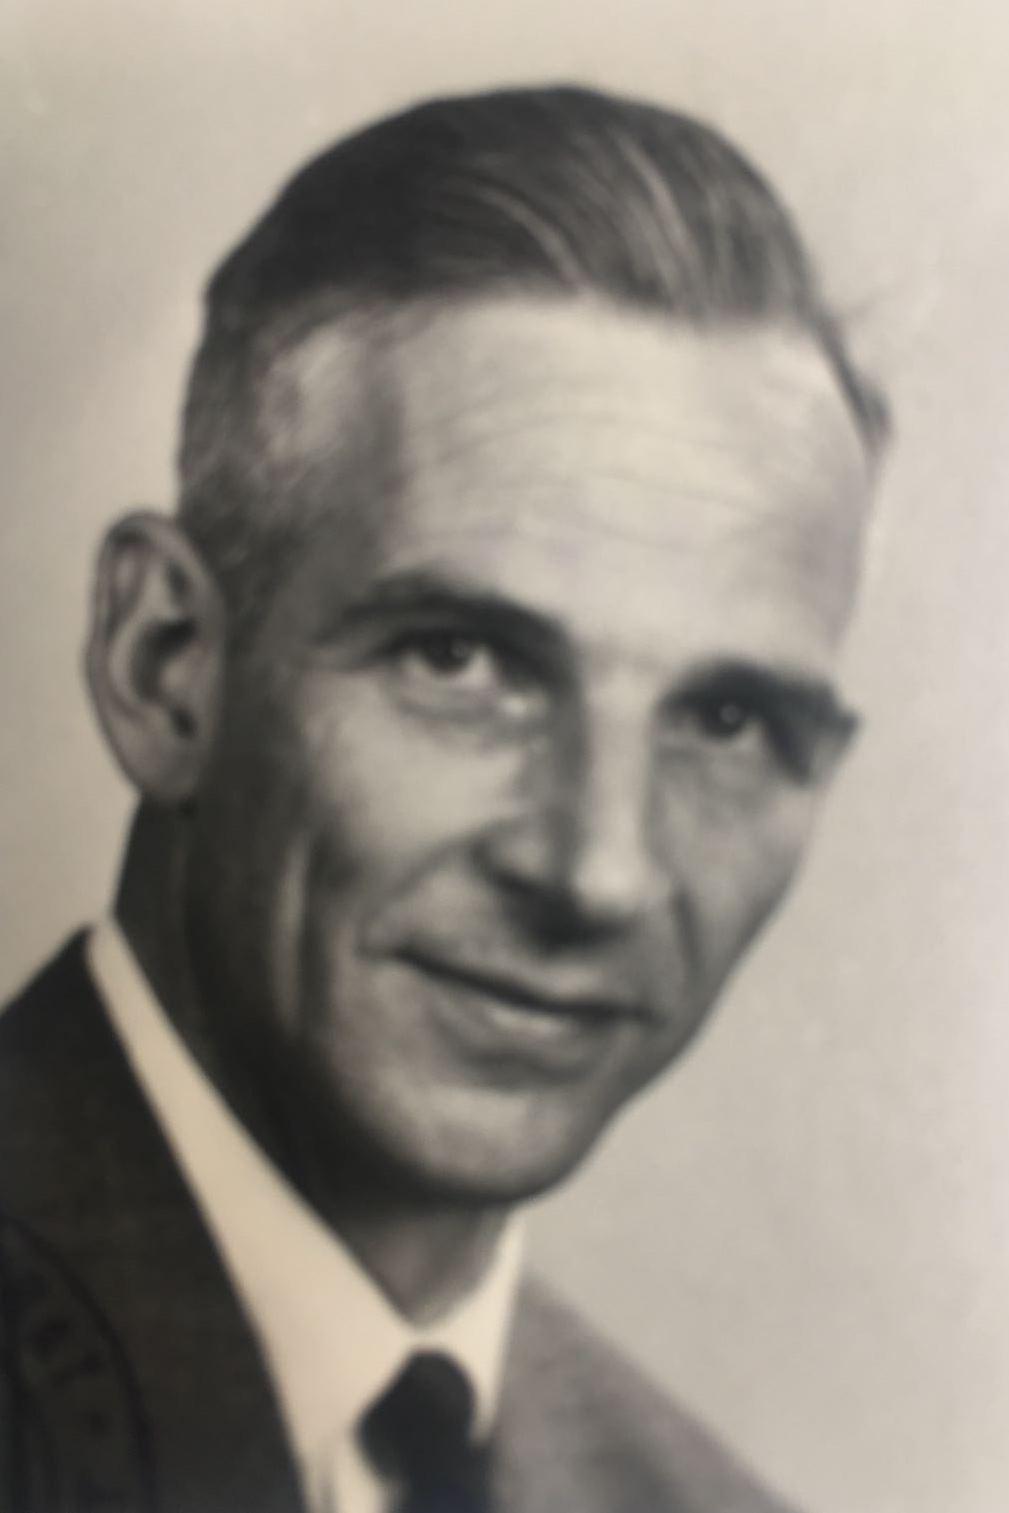 Matthias Zahn (1911-1979)